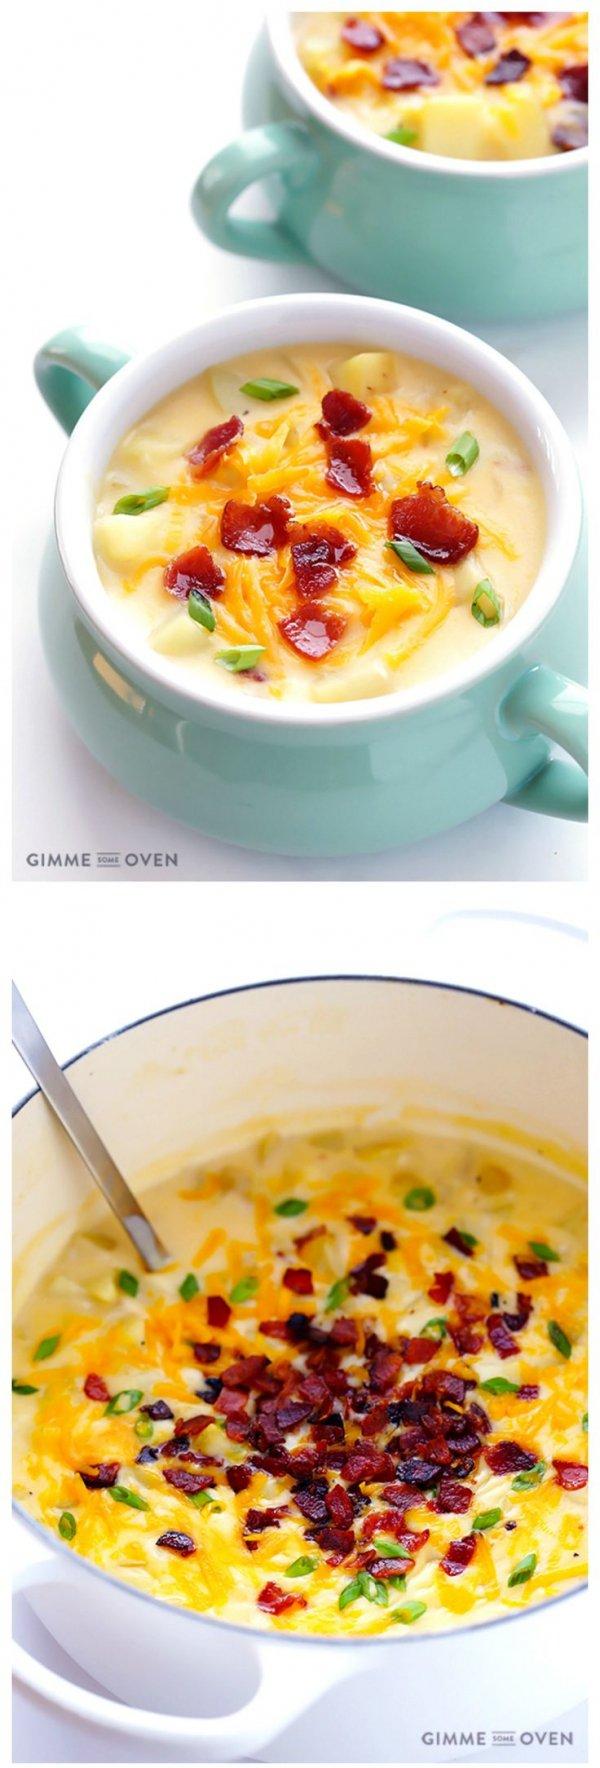 dish,food,meal,cuisine,produce,